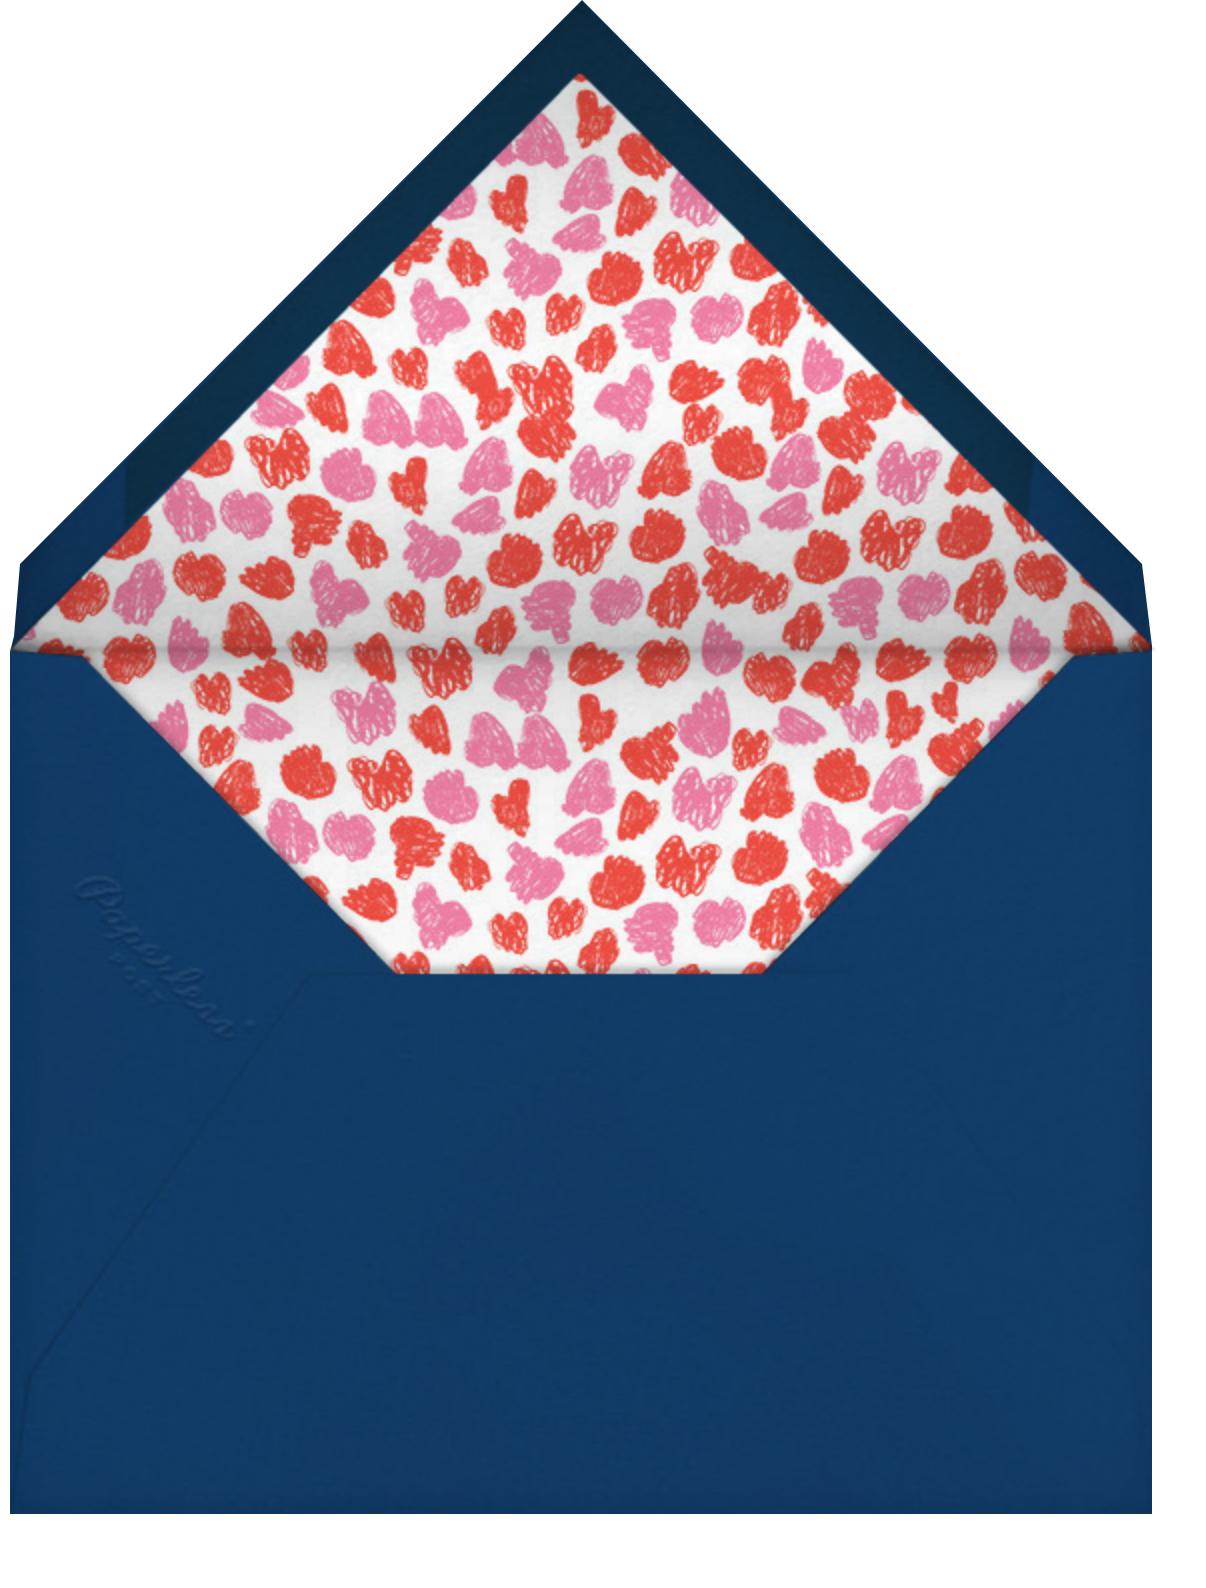 Paddle to Bliss (Save the Date) - Medium/Deep - Mr. Boddington's Studio - Save the date - envelope back